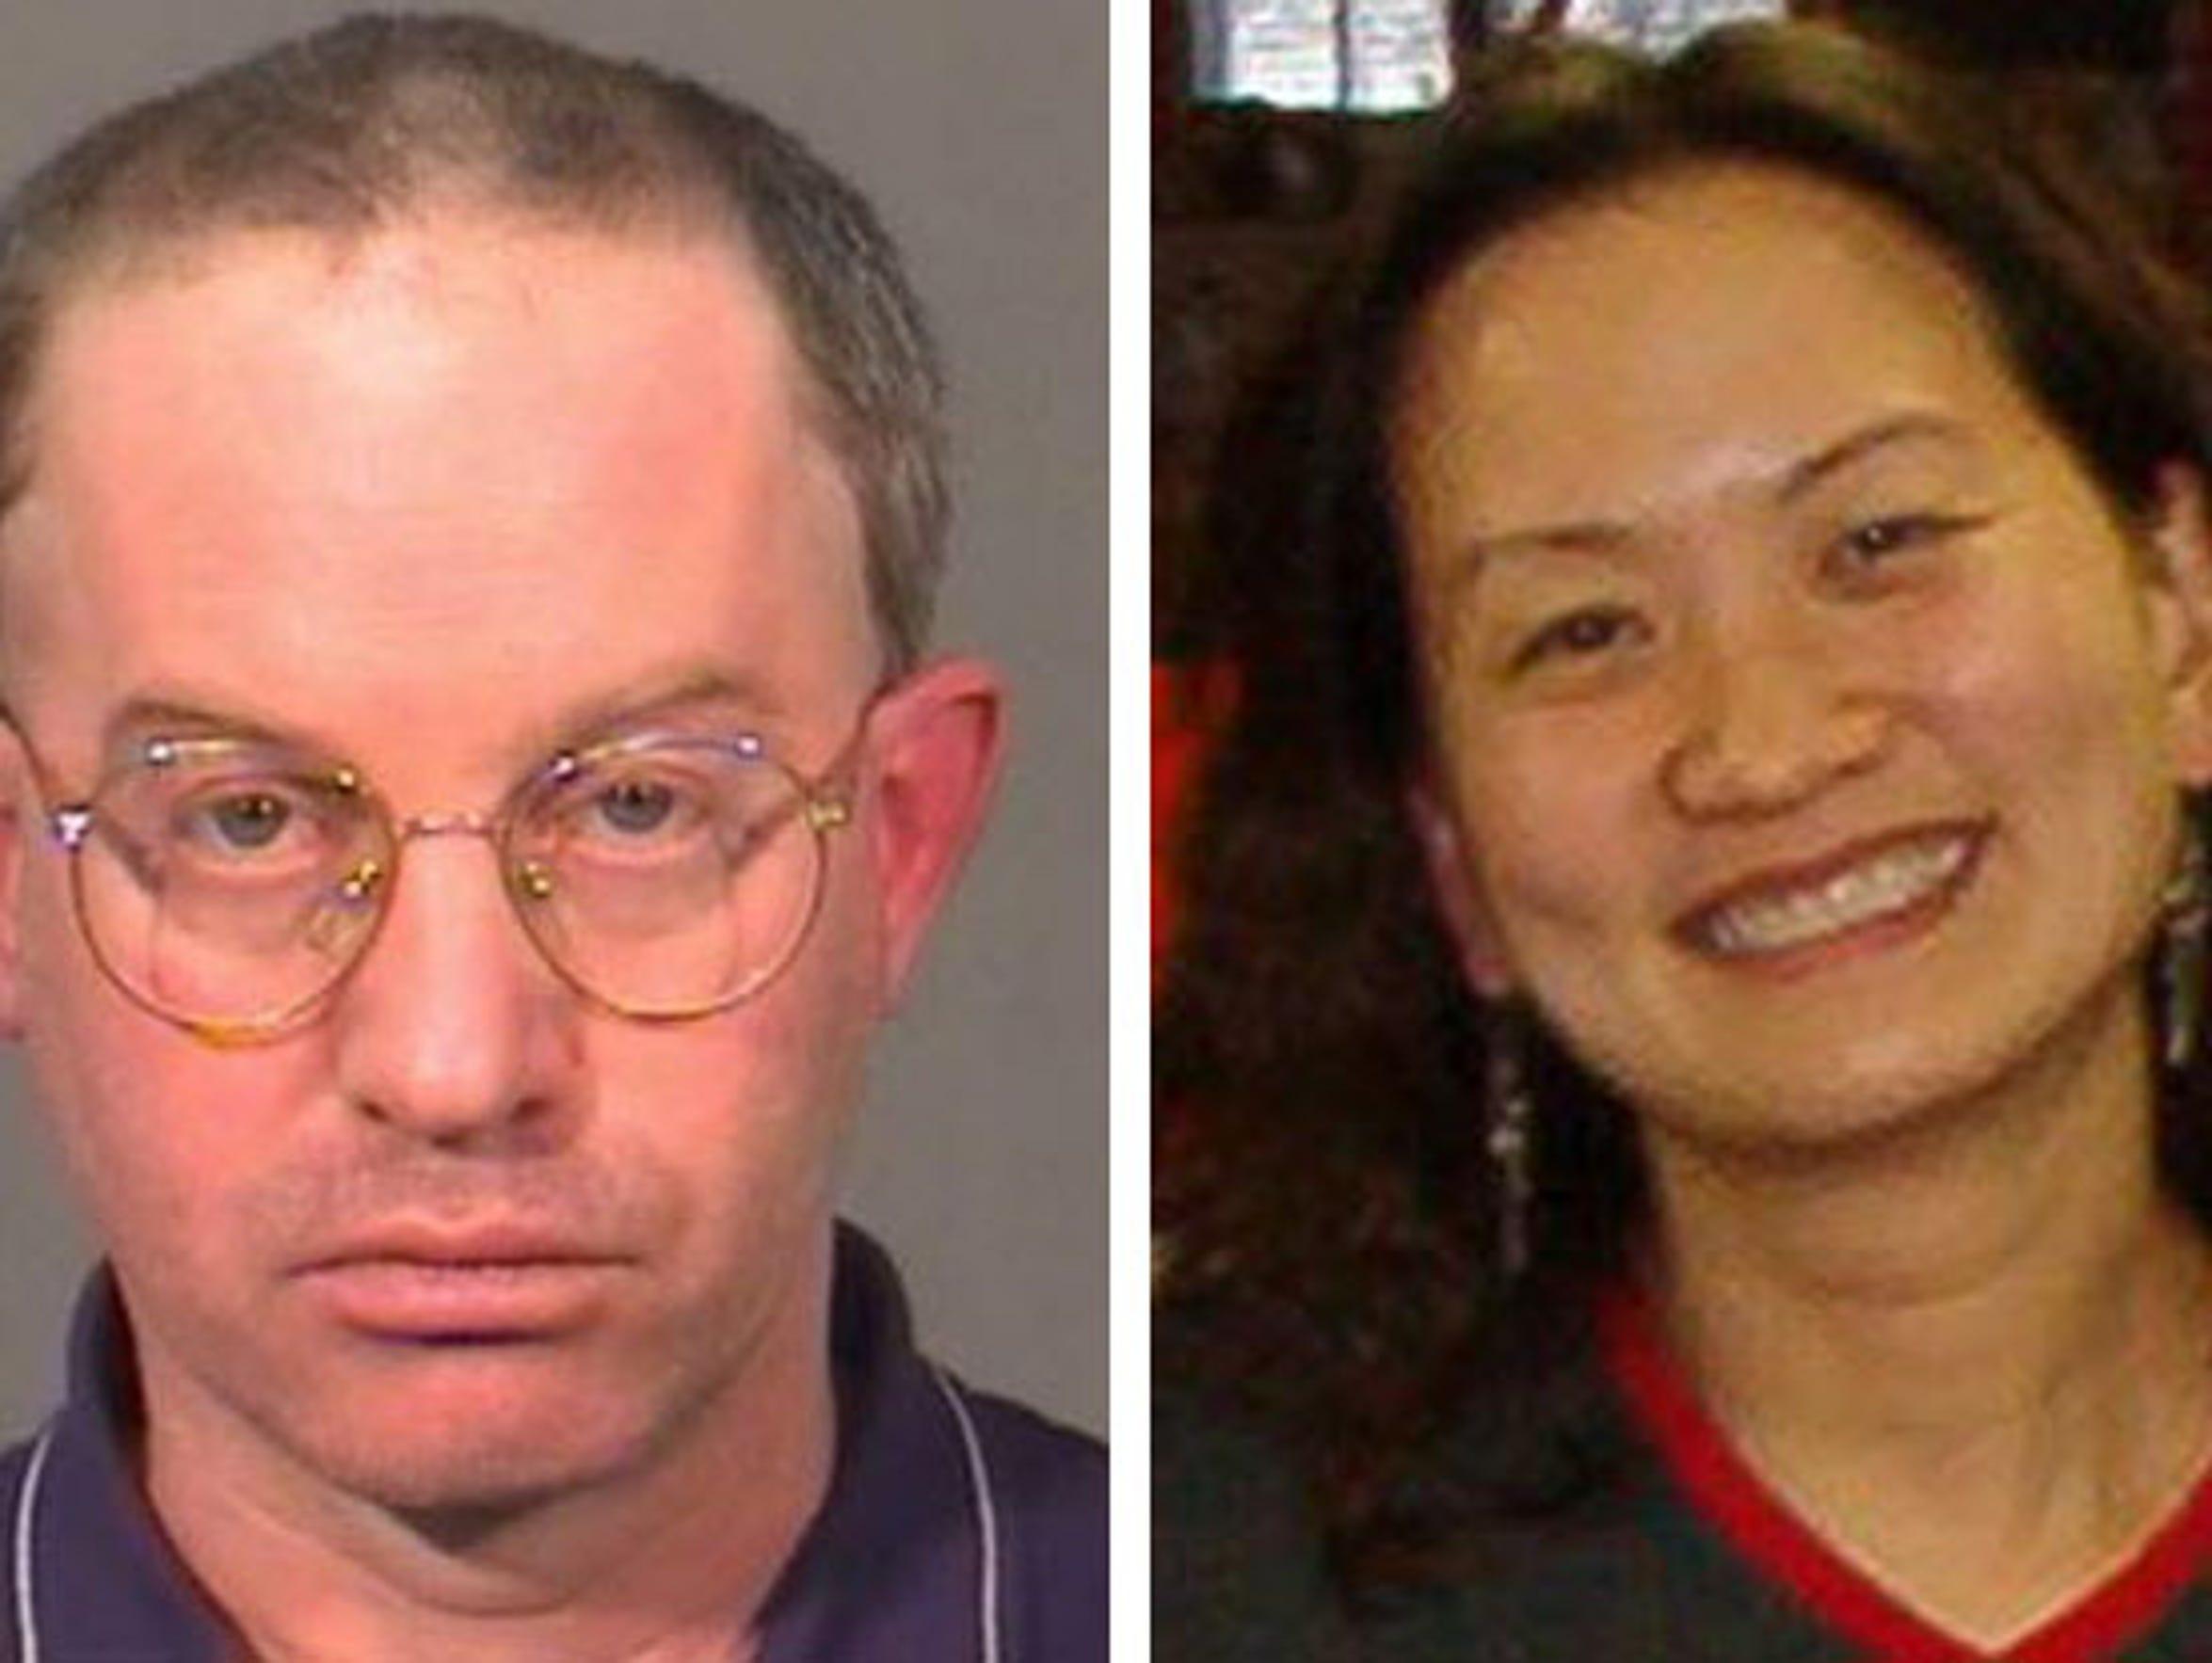 Steve Trattner (left) is serving a 35-year prison term